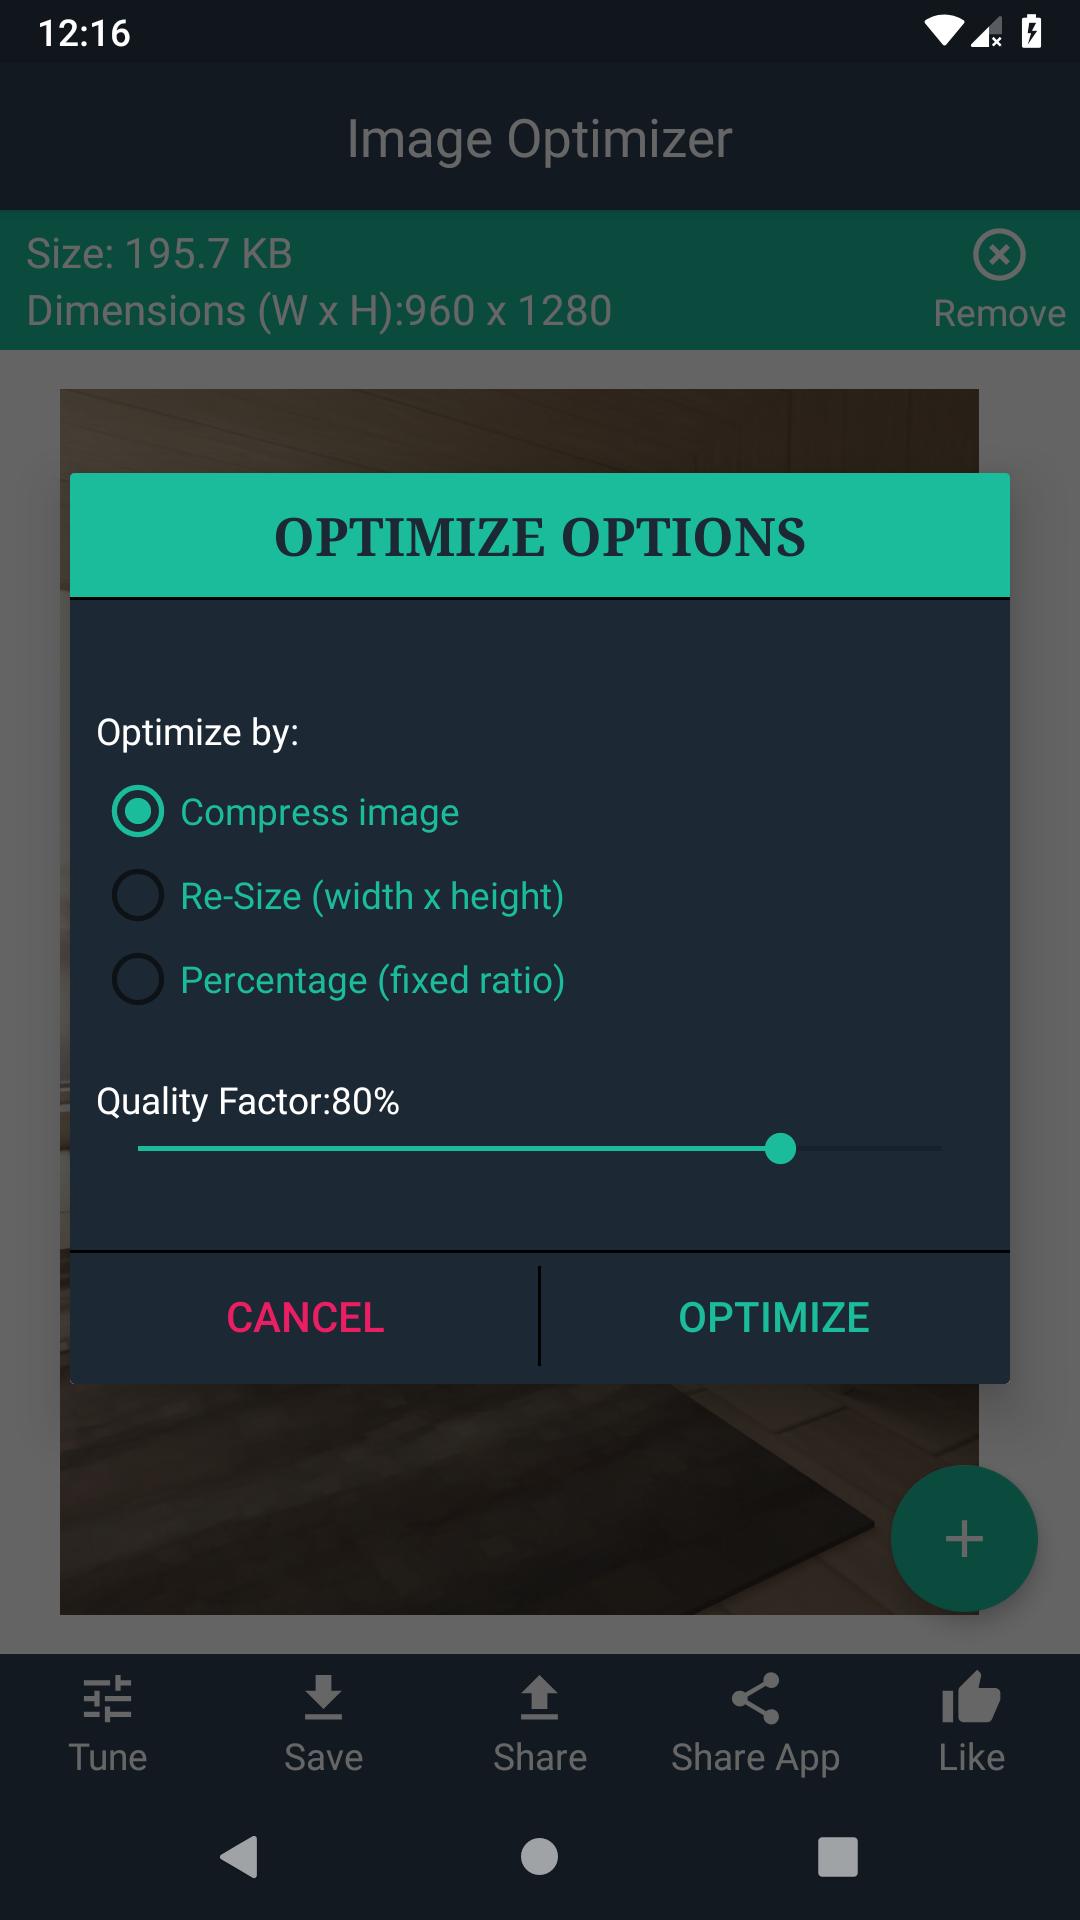 Image Optimizer & Compressor 2019 Recommended